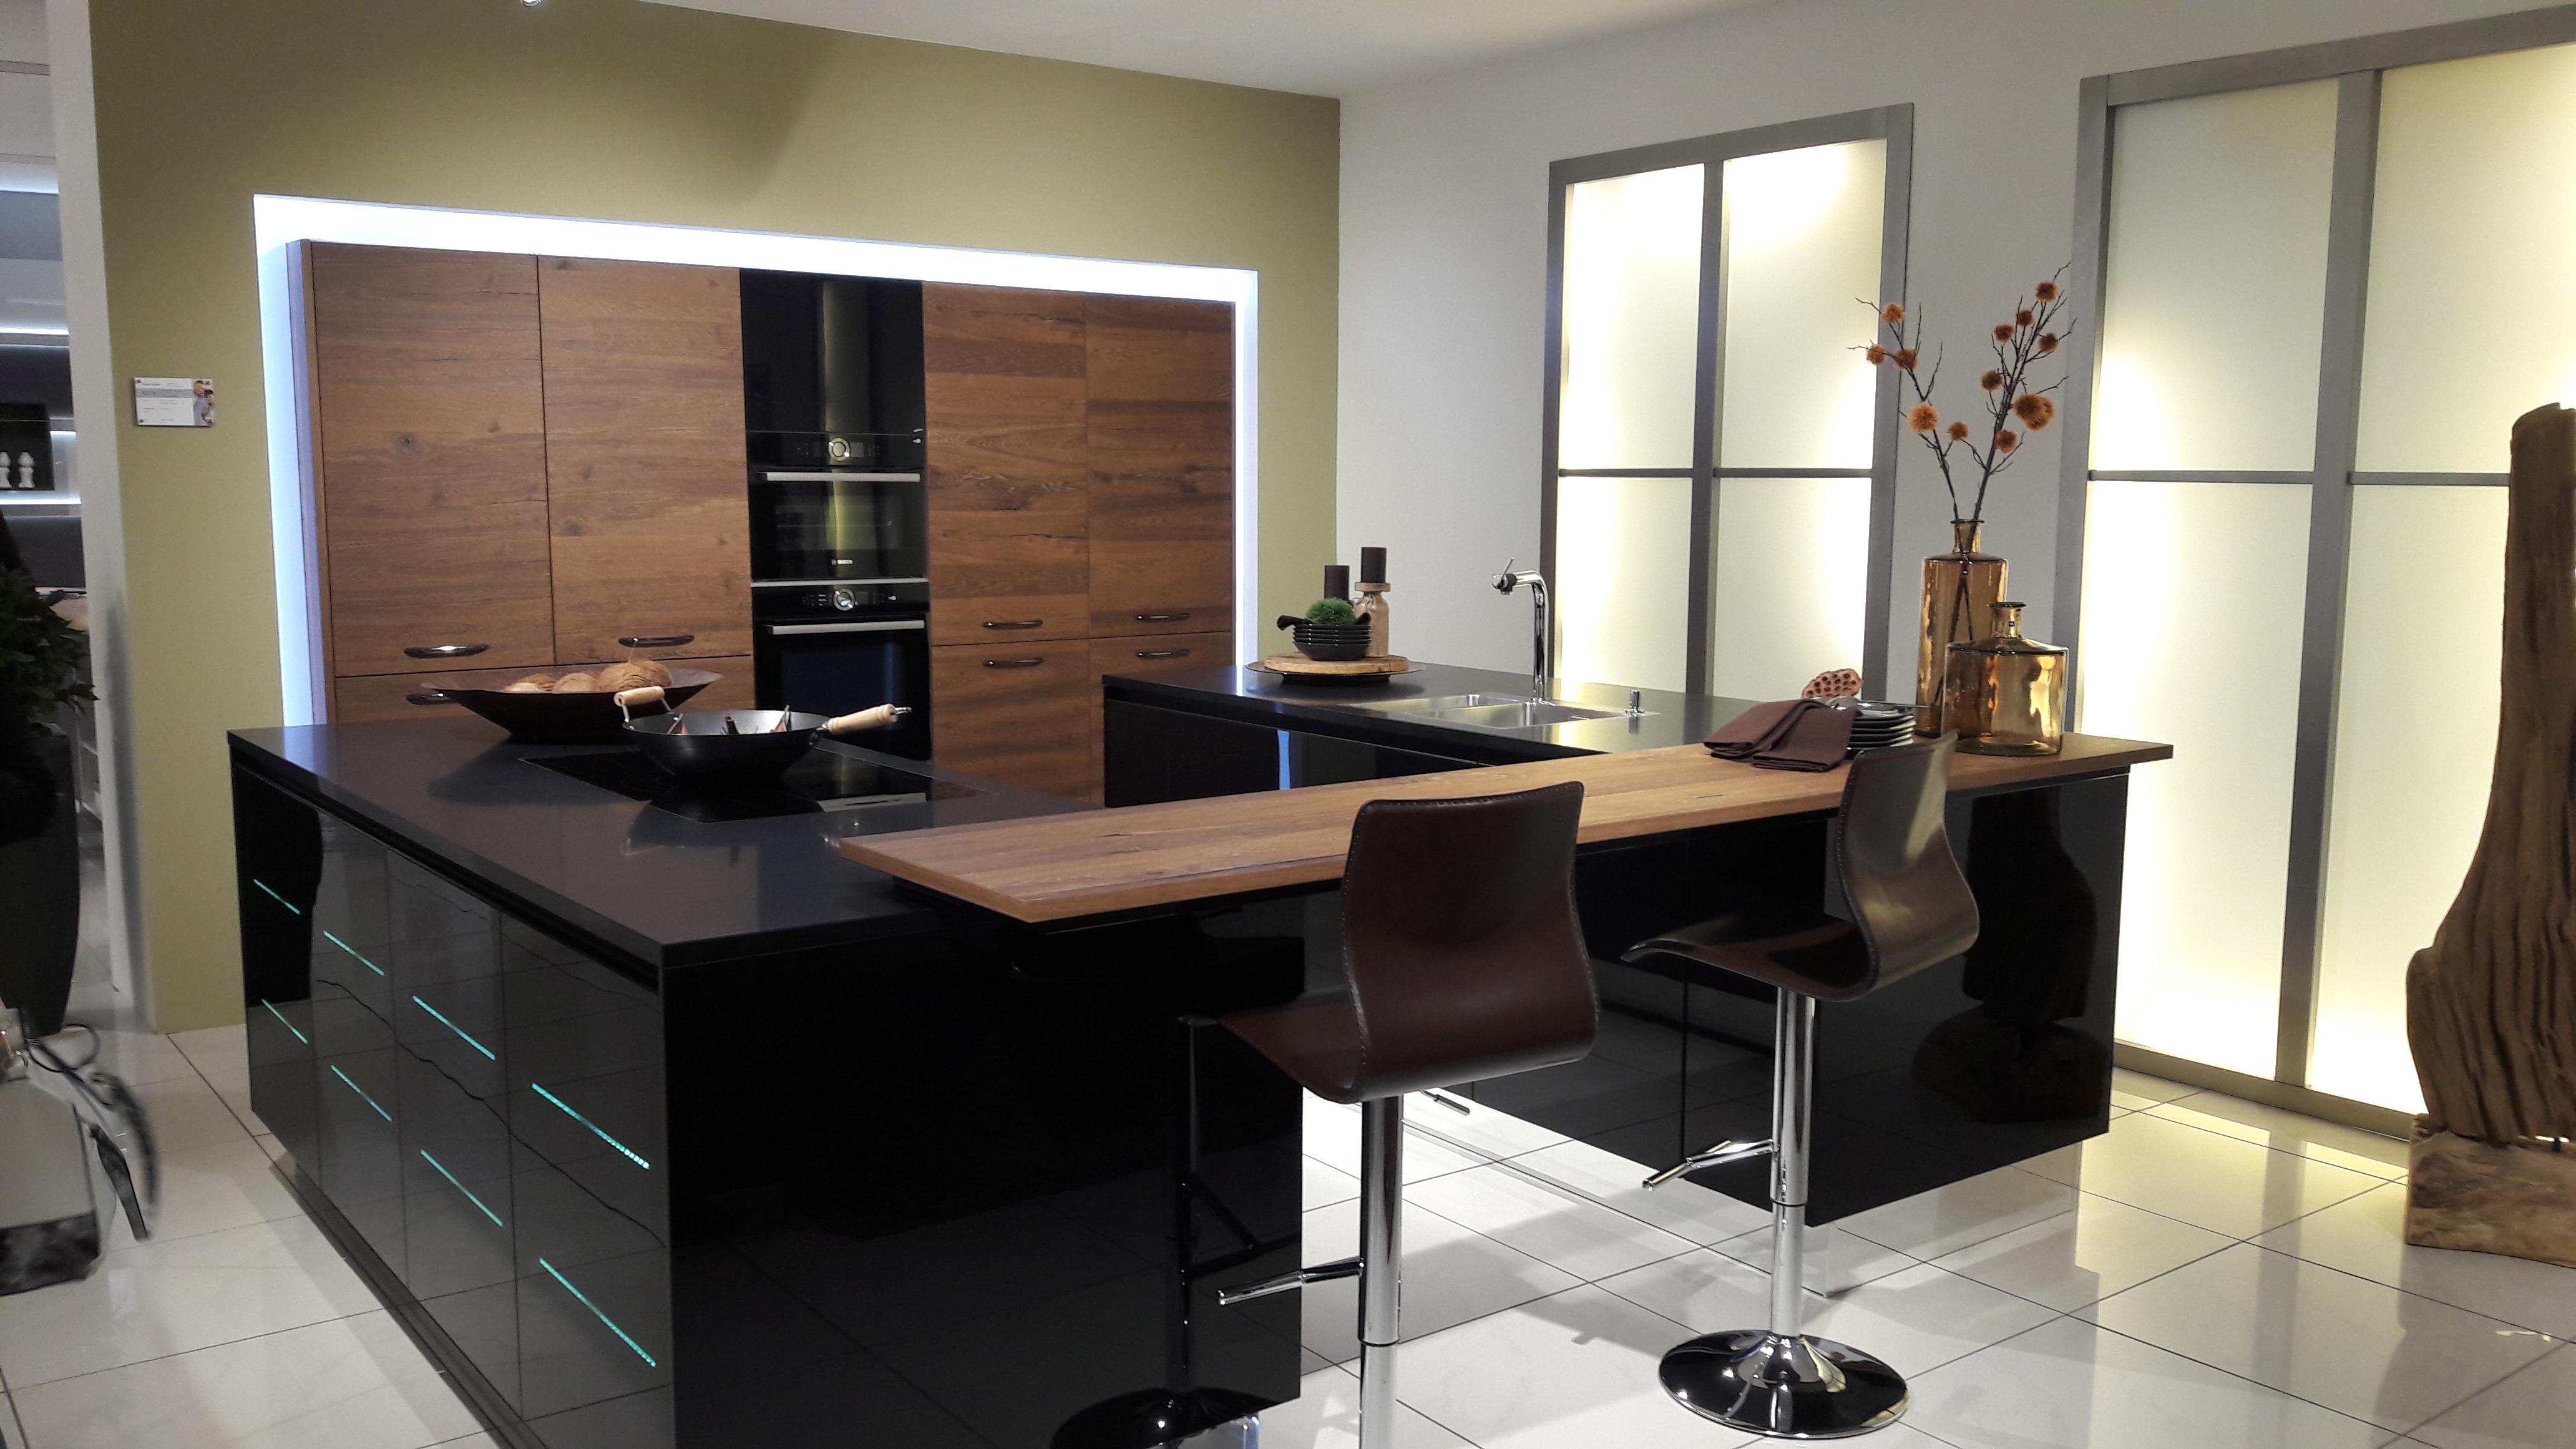 k chenidee 18 k chenmaus gmbh. Black Bedroom Furniture Sets. Home Design Ideas